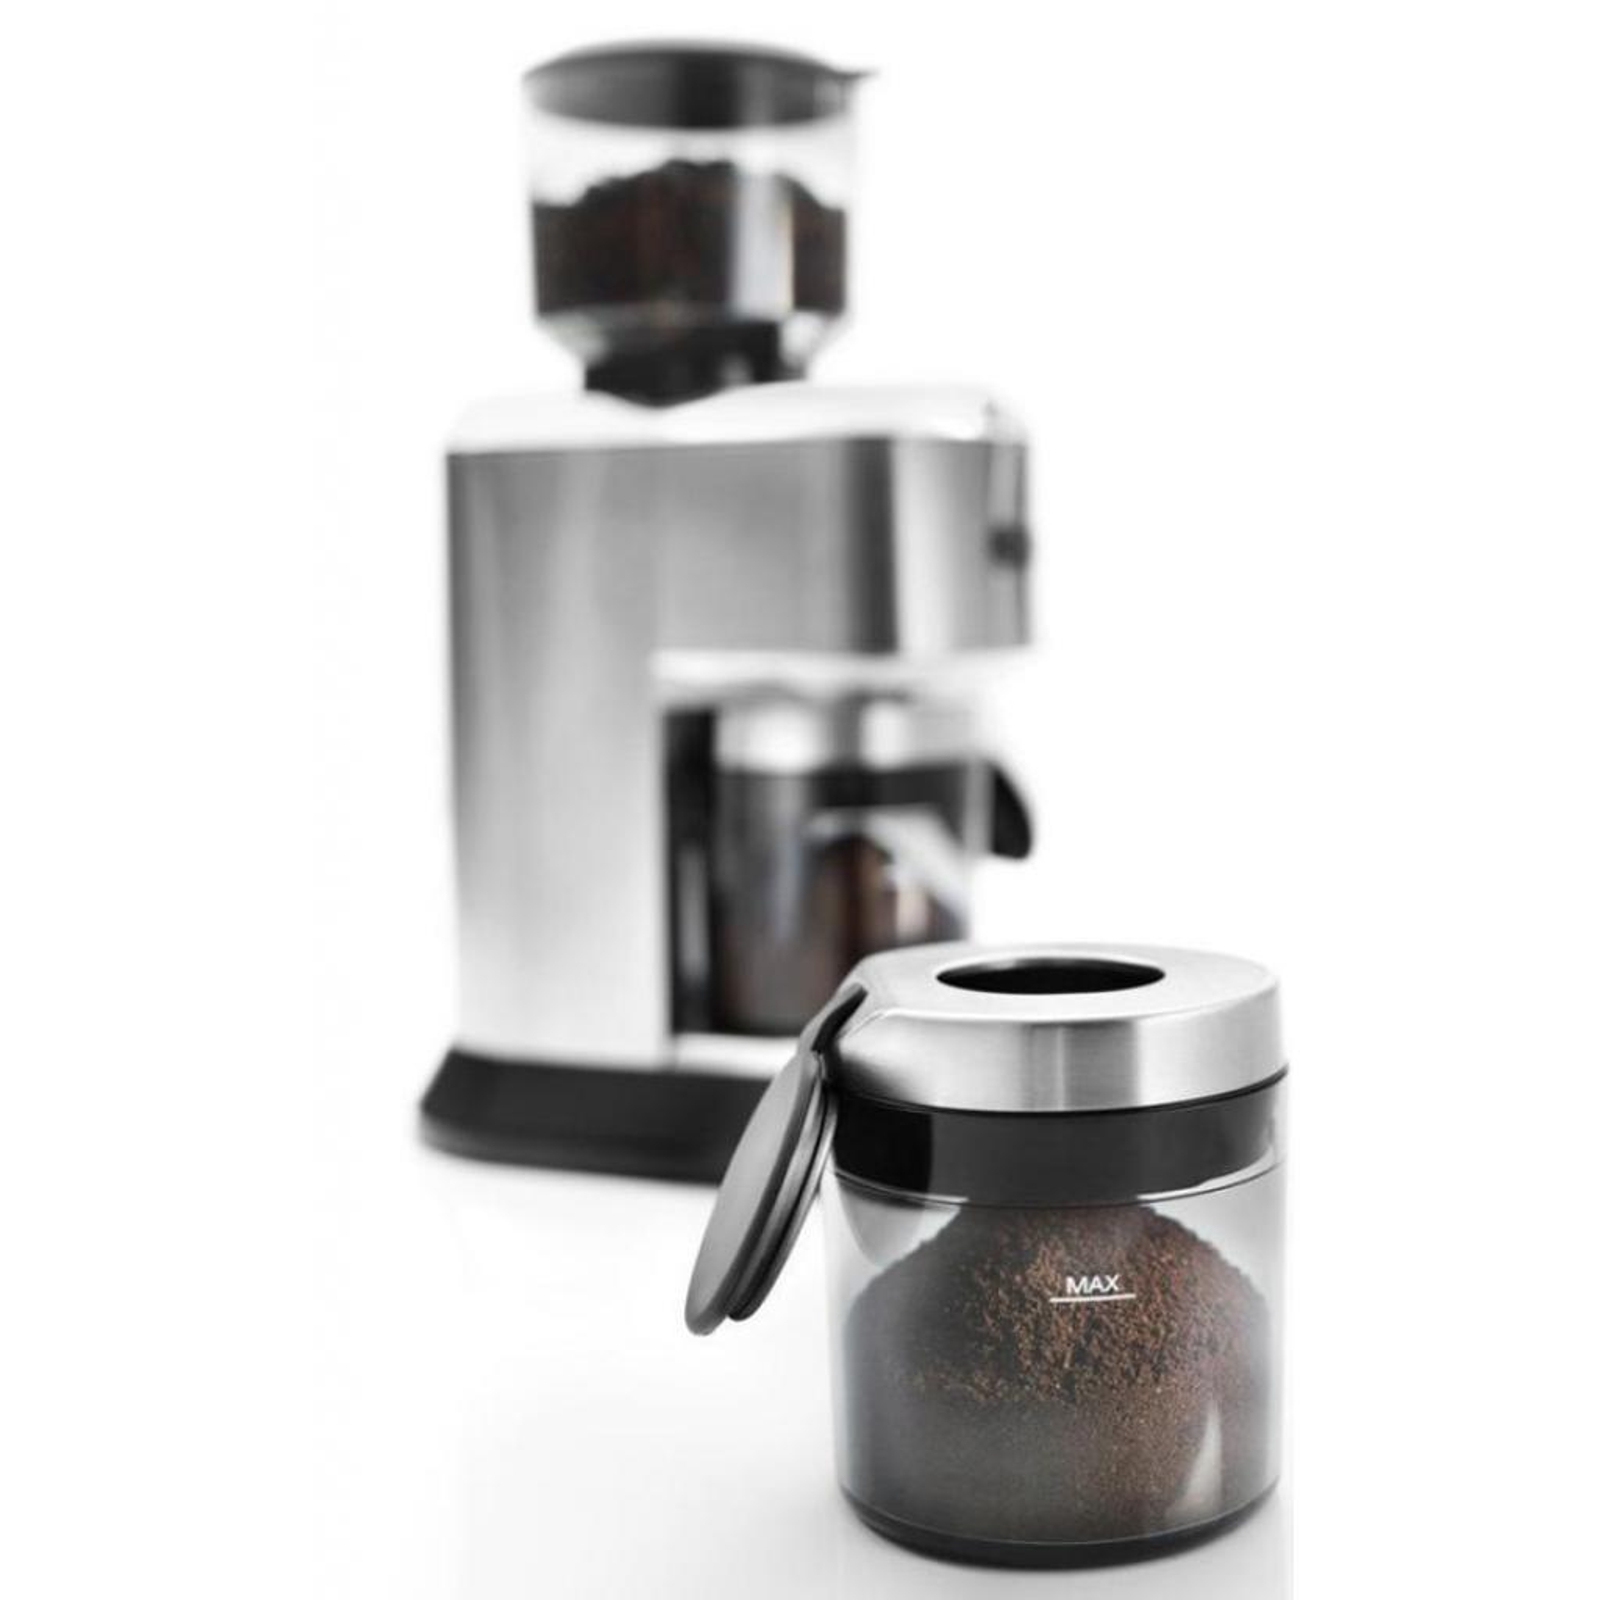 Кофемолка DeLonghi KG 521 M изображение 4